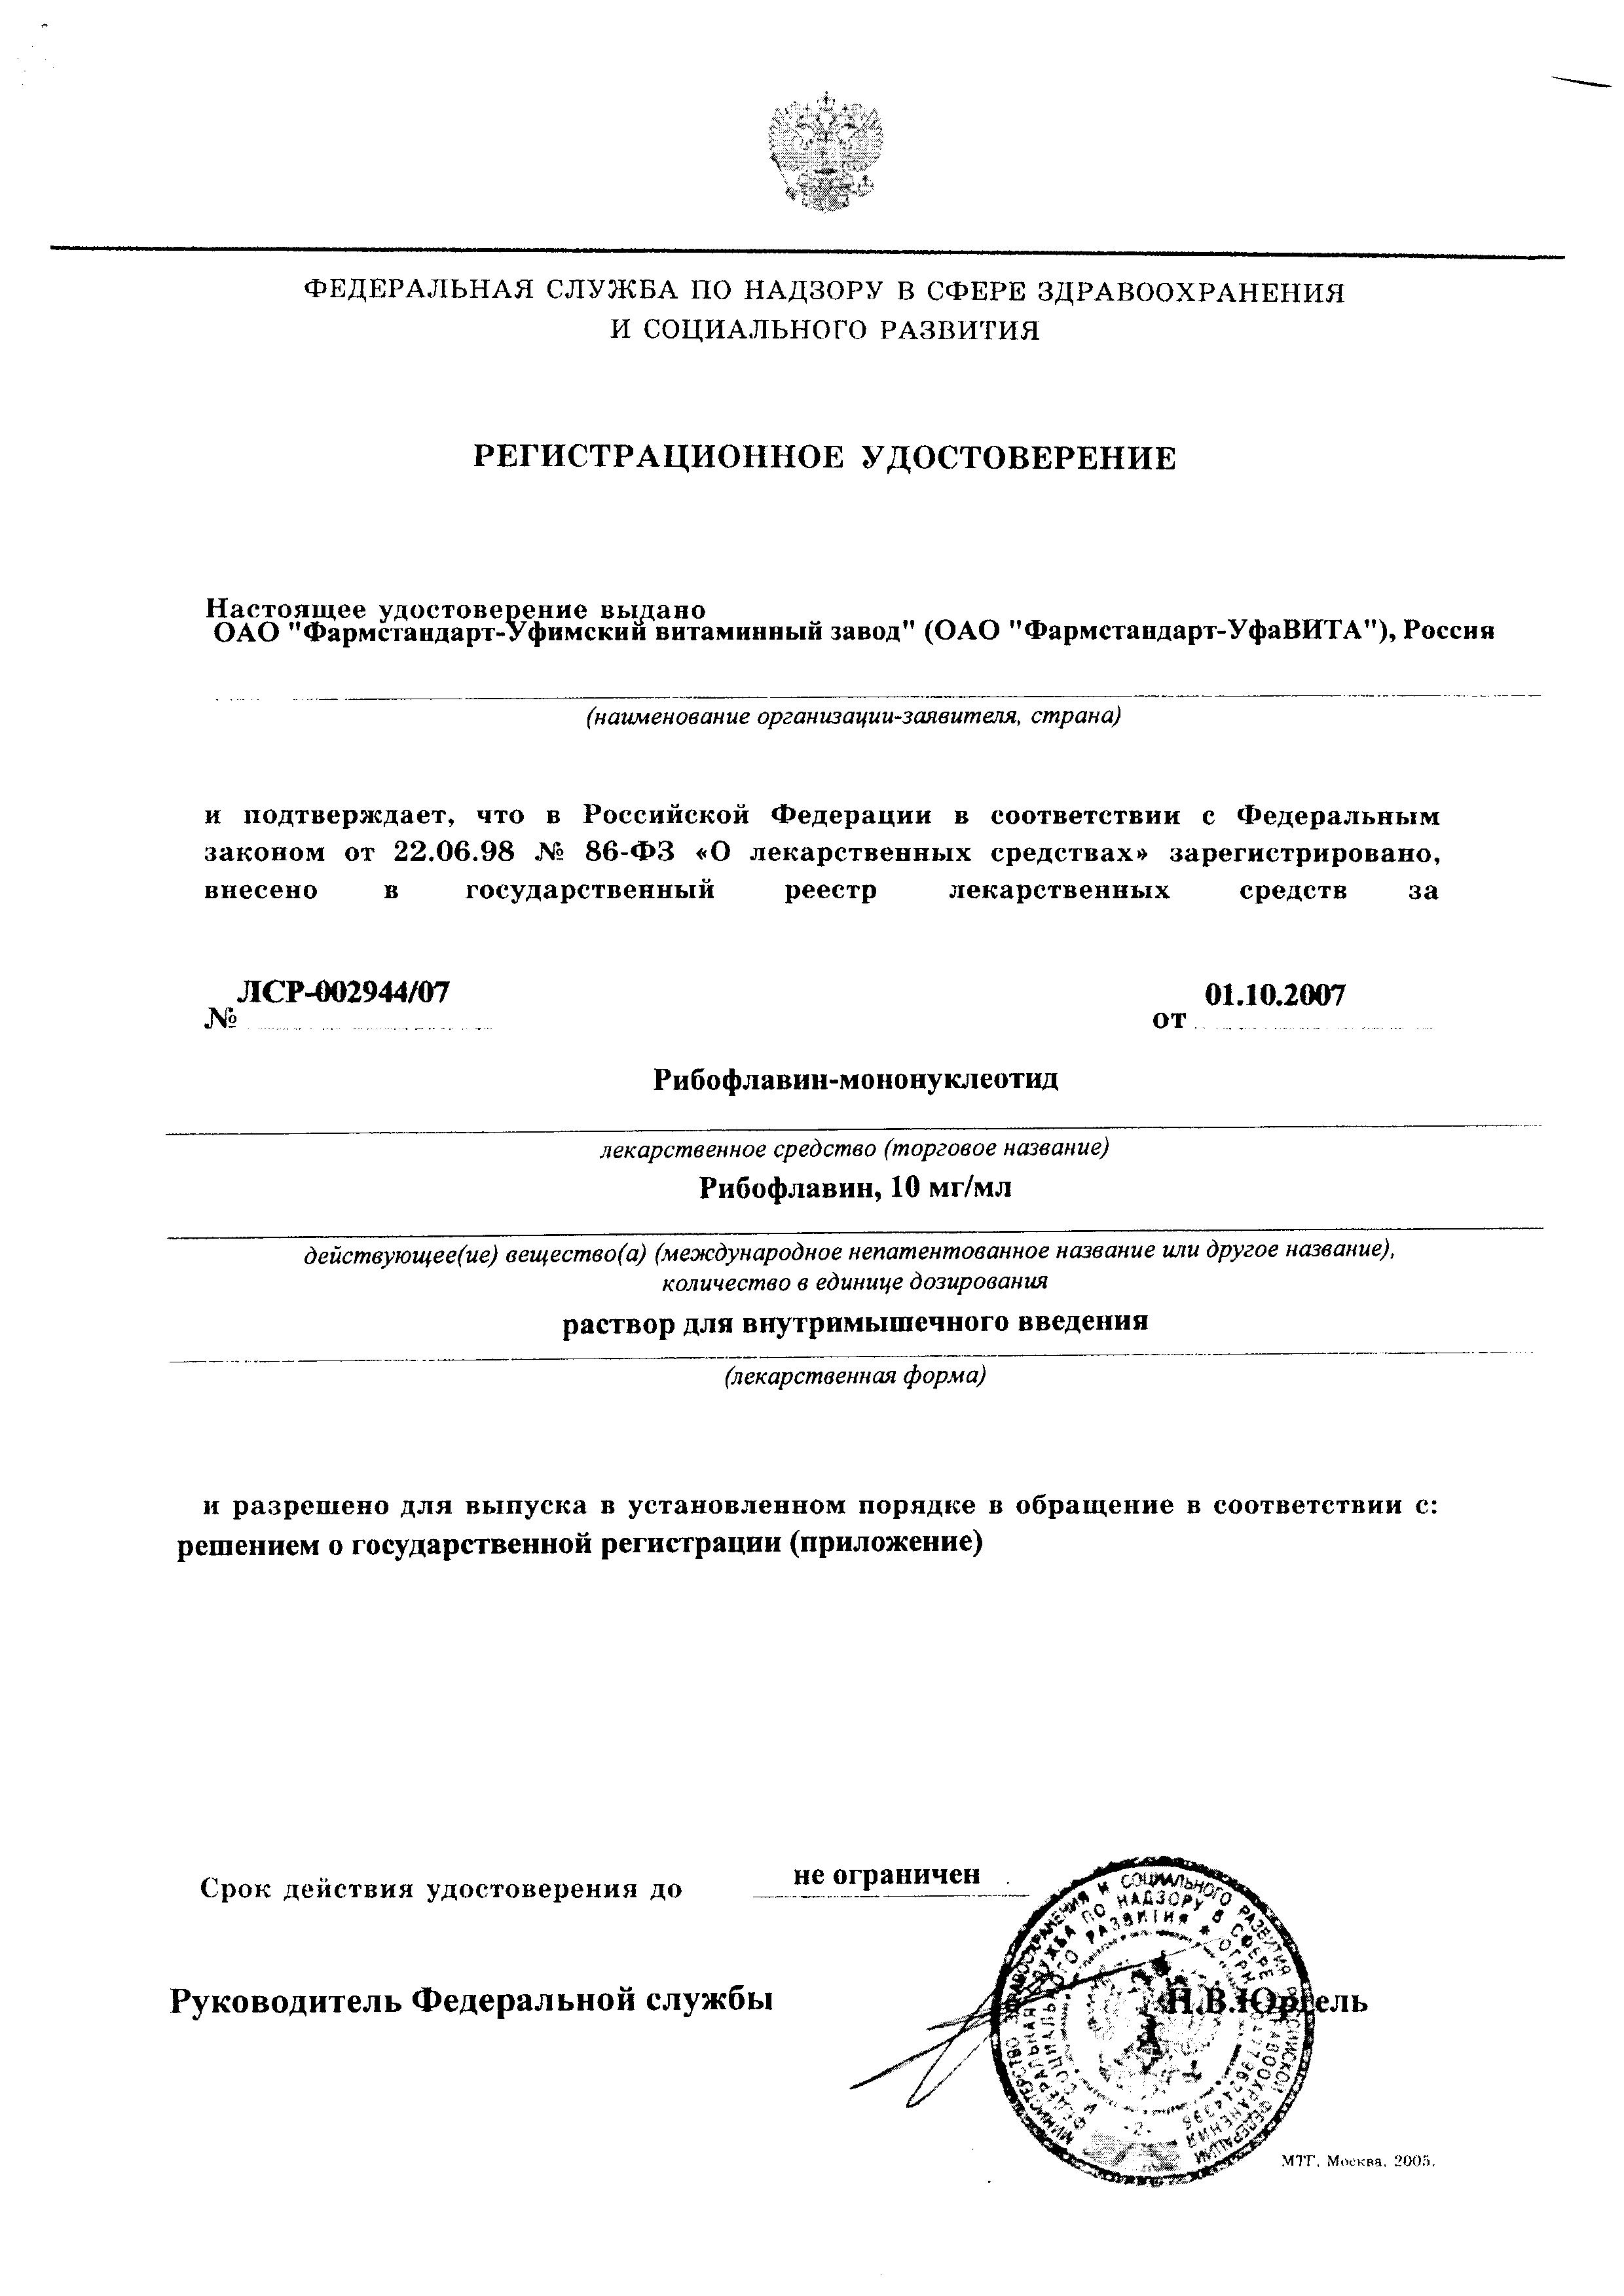 Рибофлавин-мононуклеотид сертификат